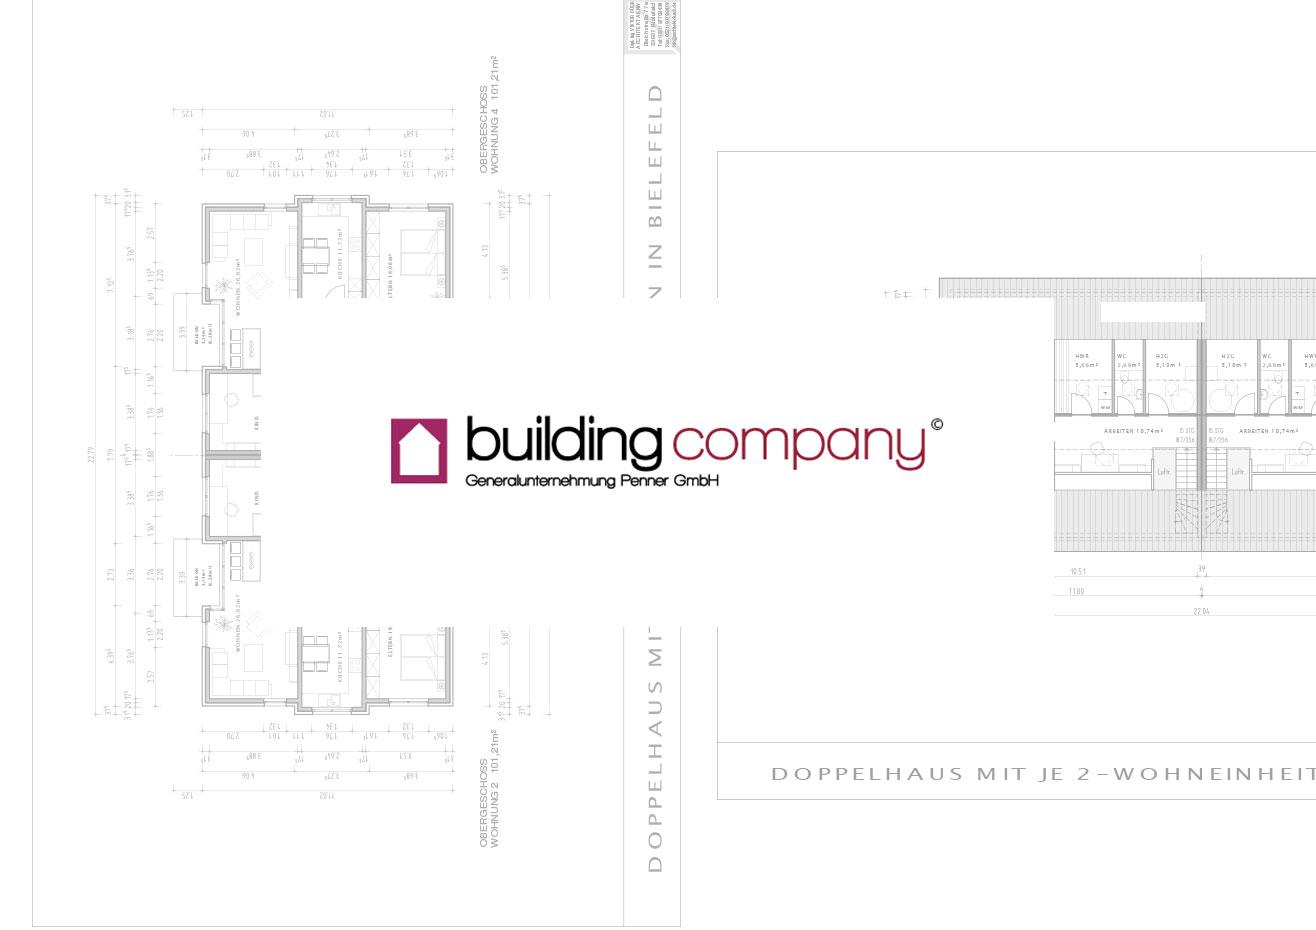 building company Corporate Design